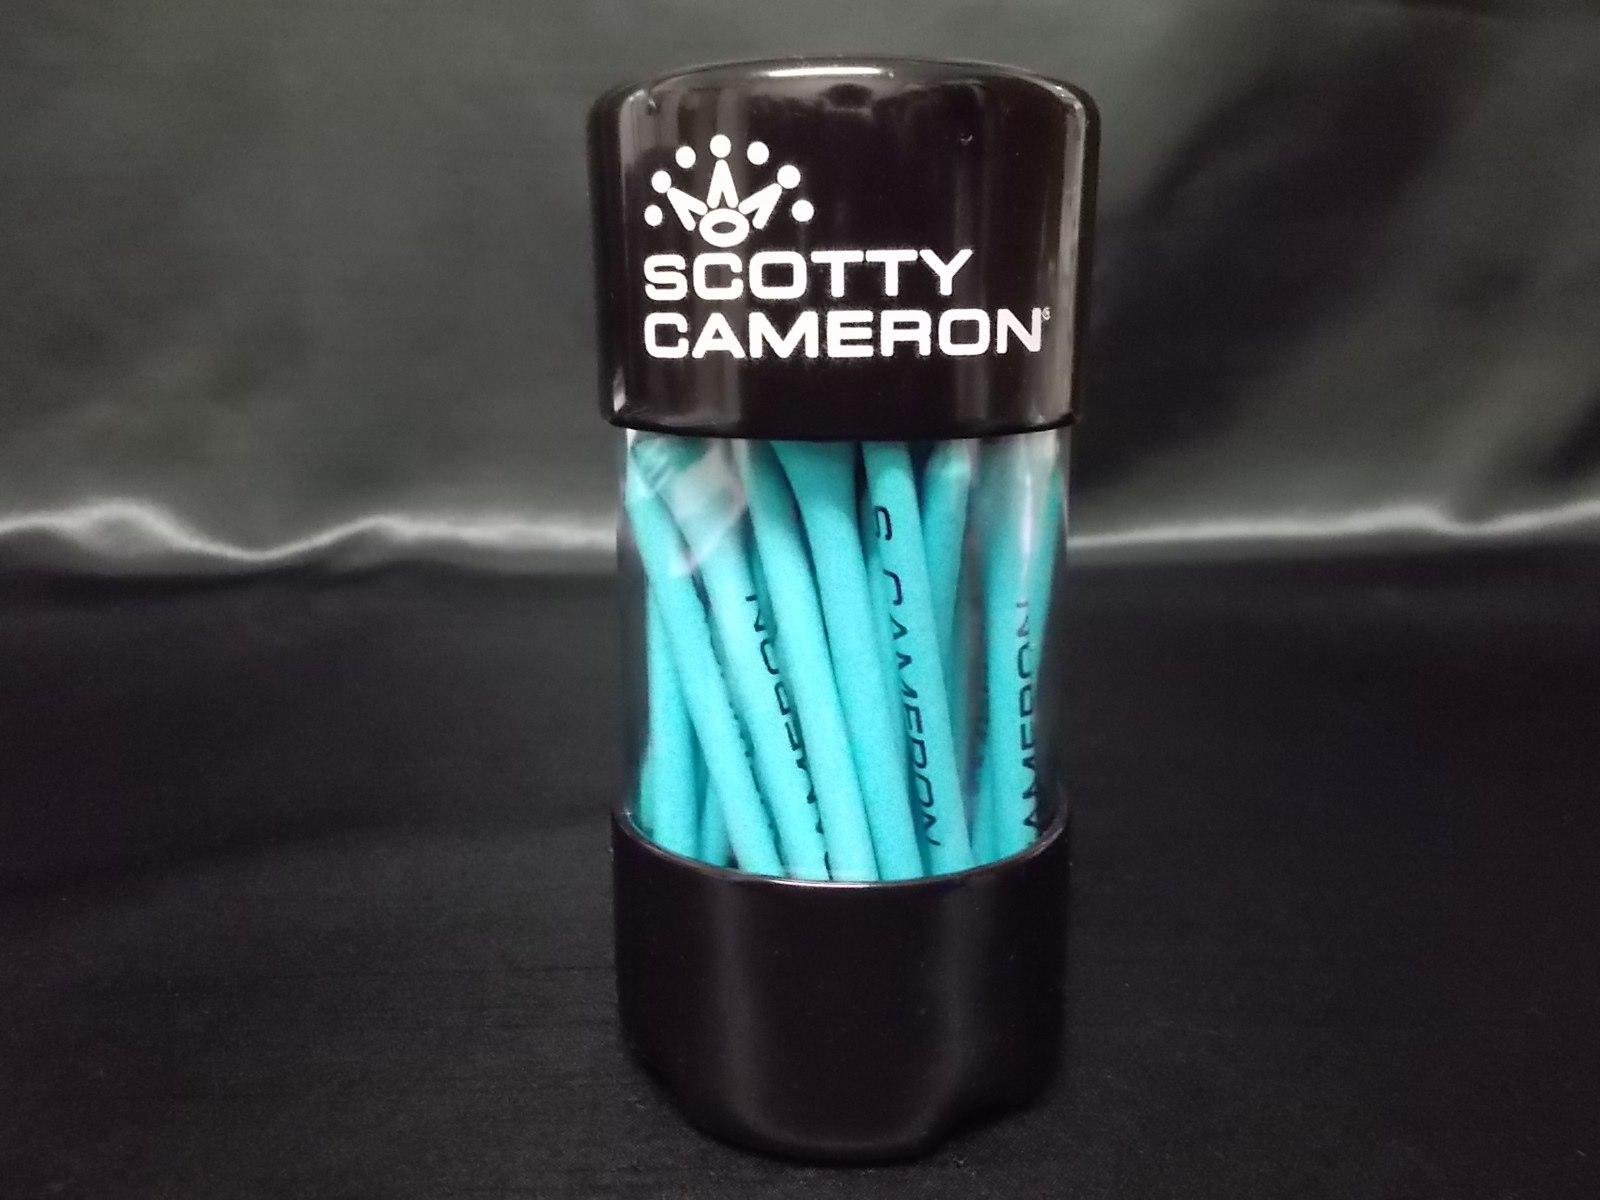 Scotty Cameron Tiffany Blue CircleT Golf Tees Pack Large スコッティキャメロン ウッドティーセット ラージ サークルT ティファニーブルー ロングティー